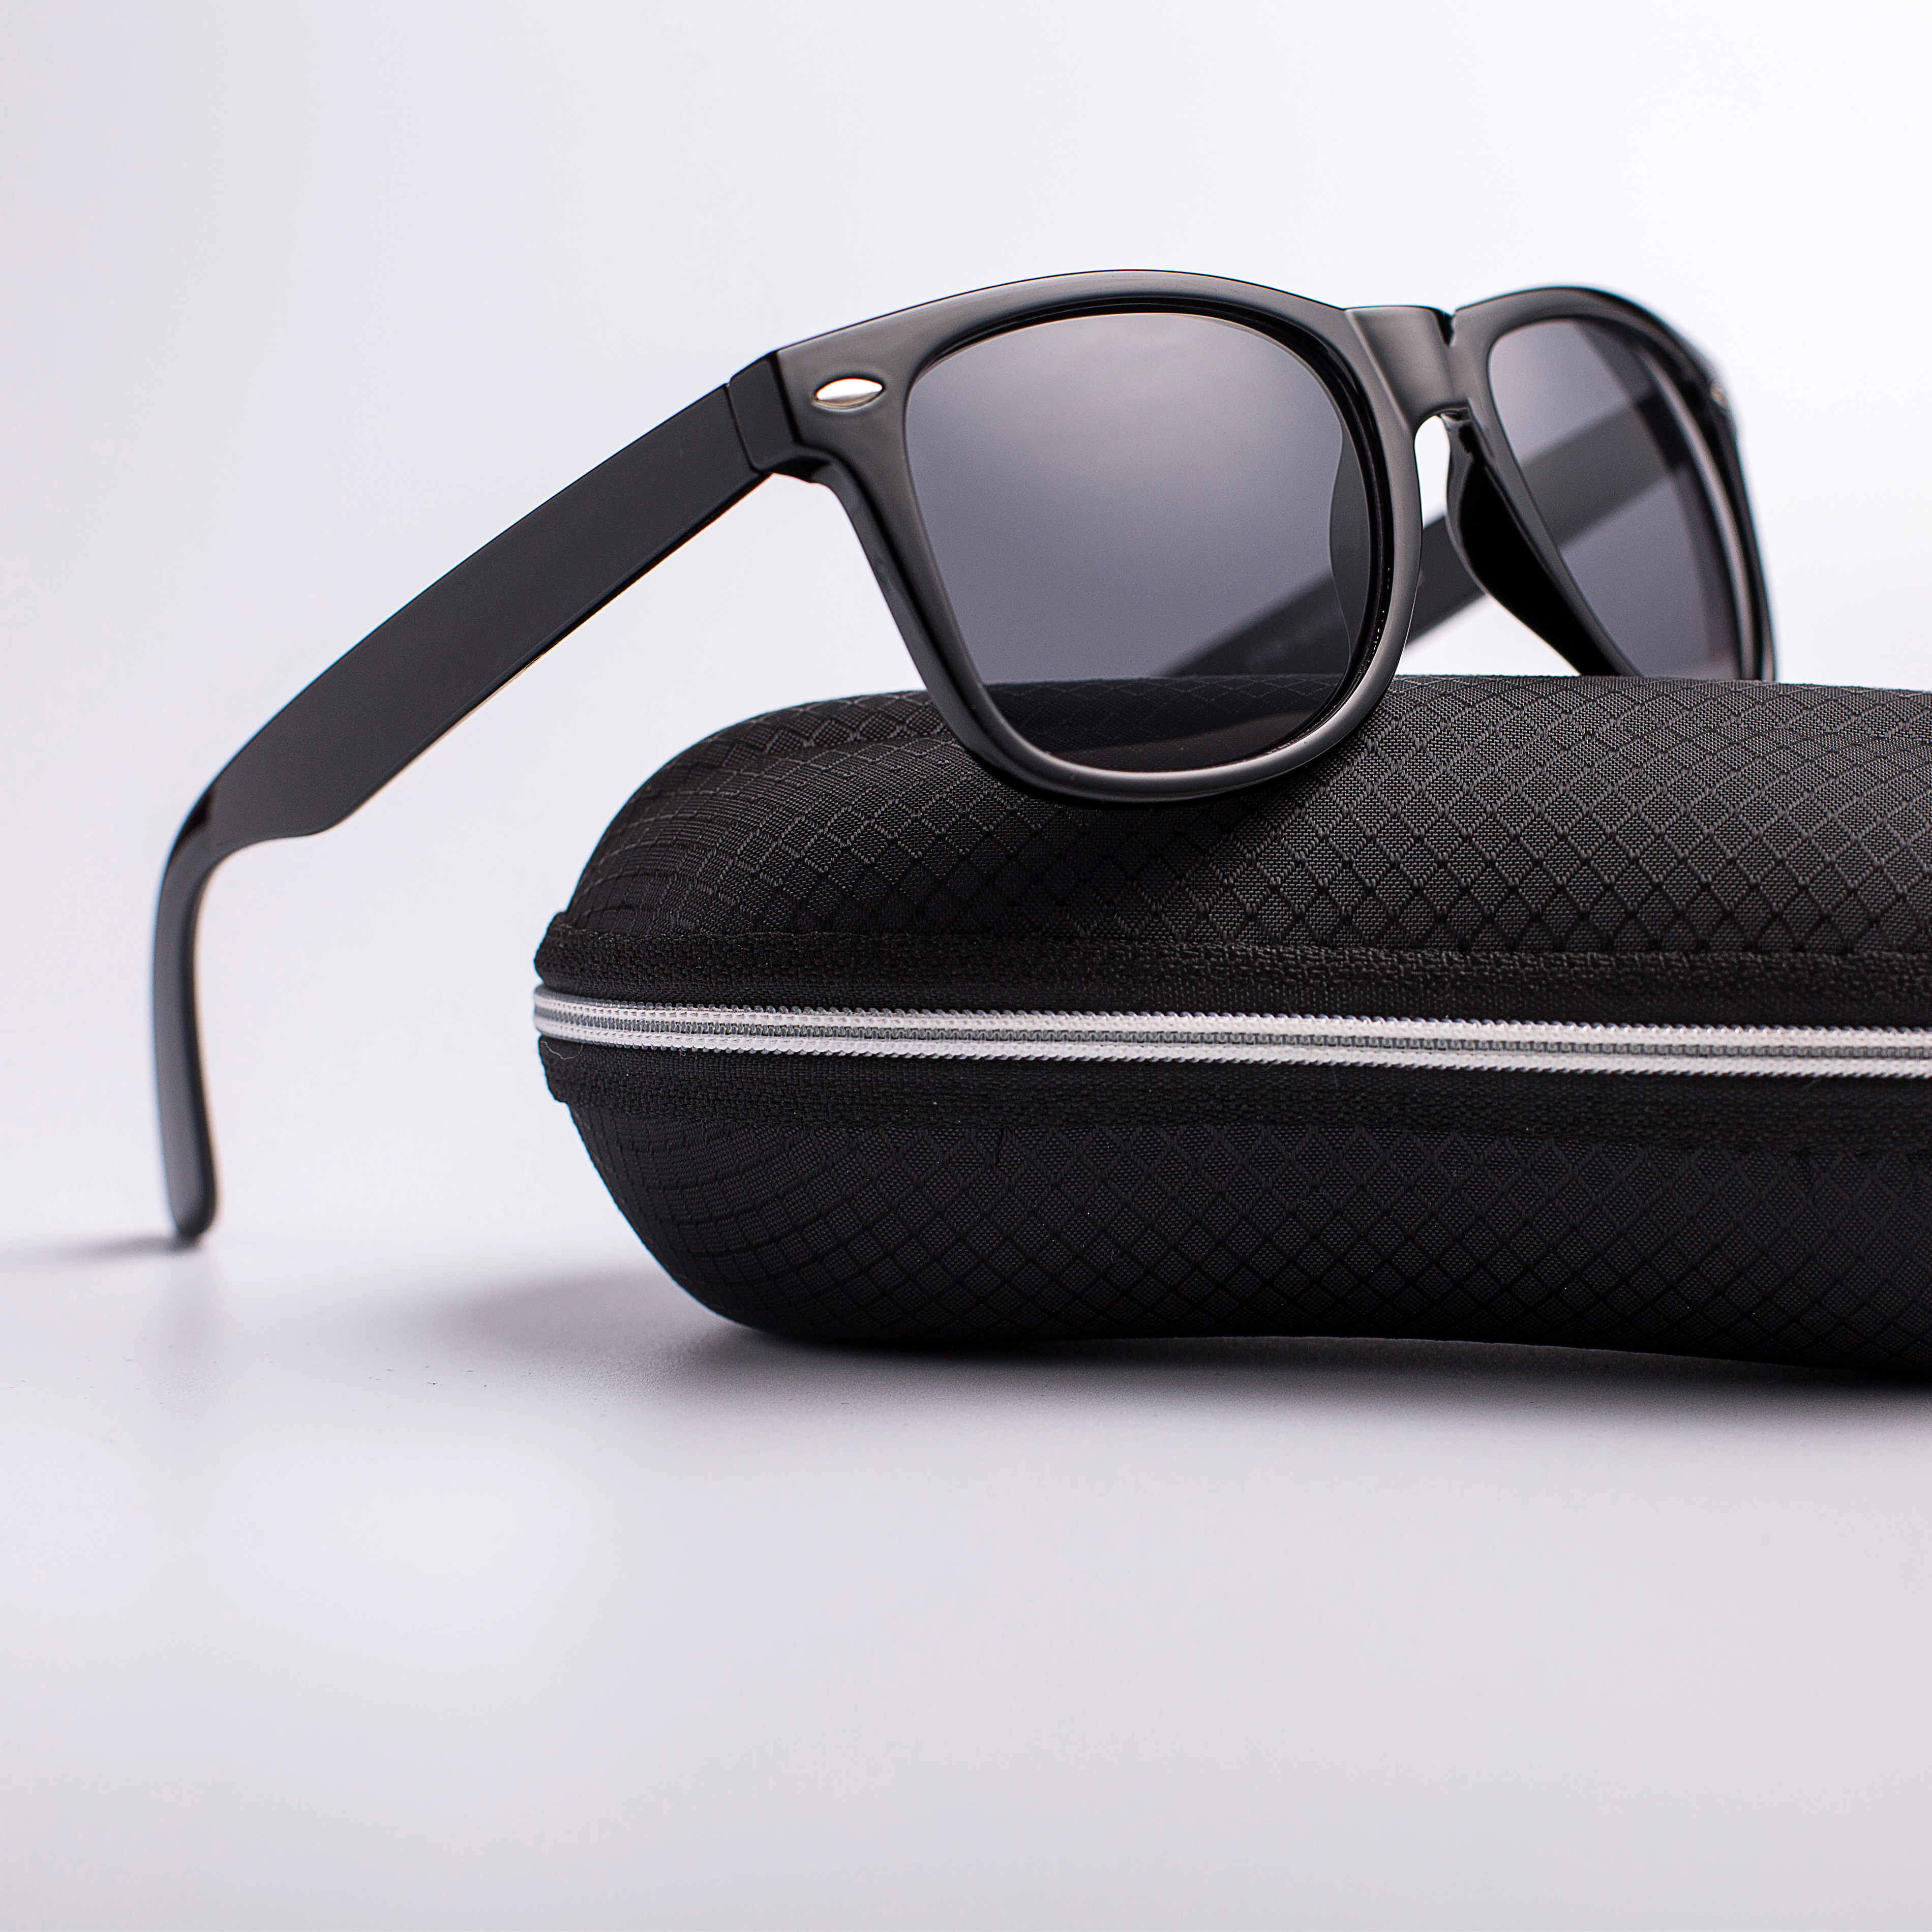 Vintage Polarized Sunglasses Men Women Brand Designer Driver Shades Male Sun Glasses Women Men Spuare Mirror Summer UV400 Oculos